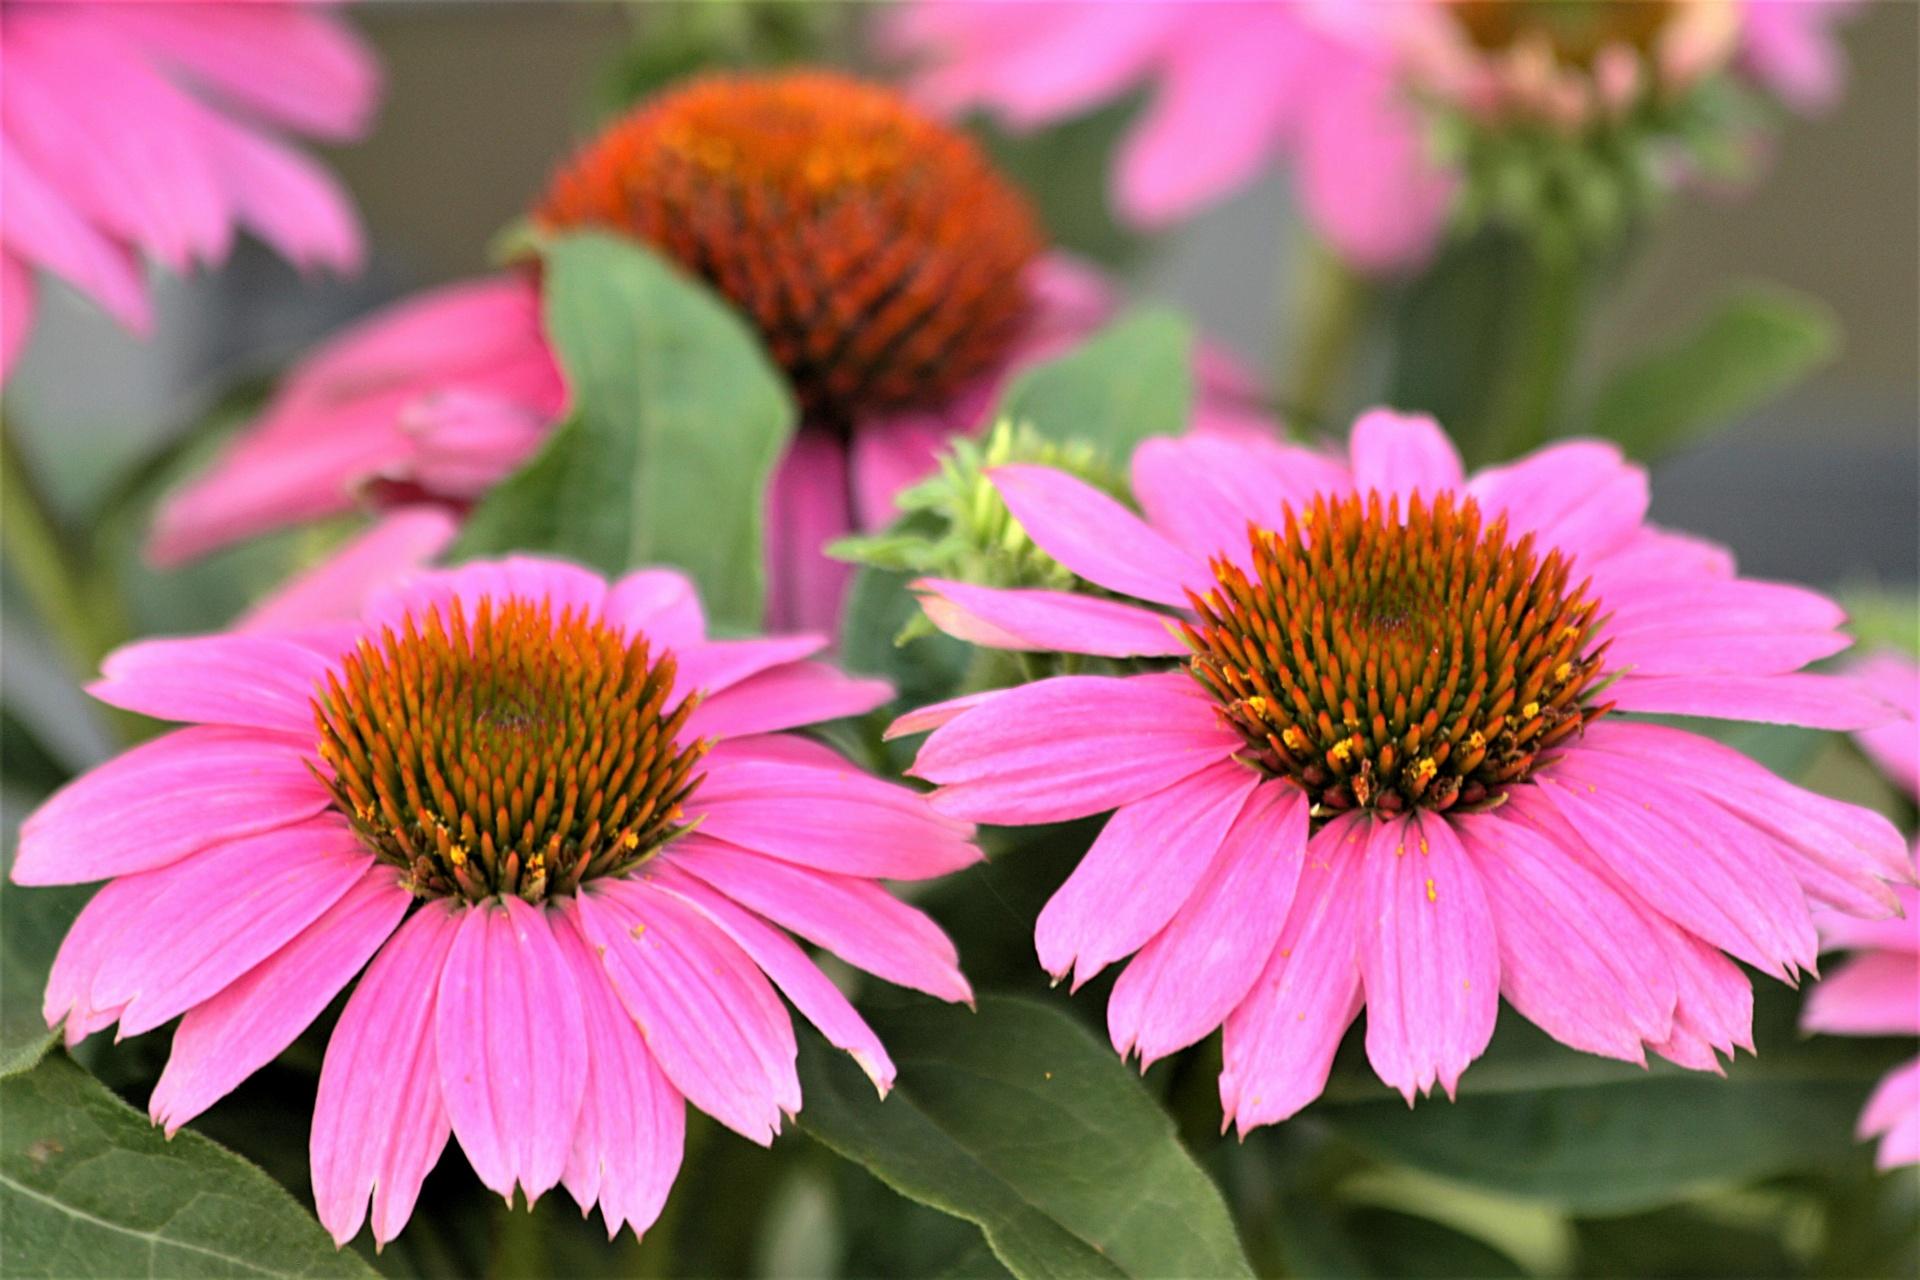 Pink coneflower closeup photo